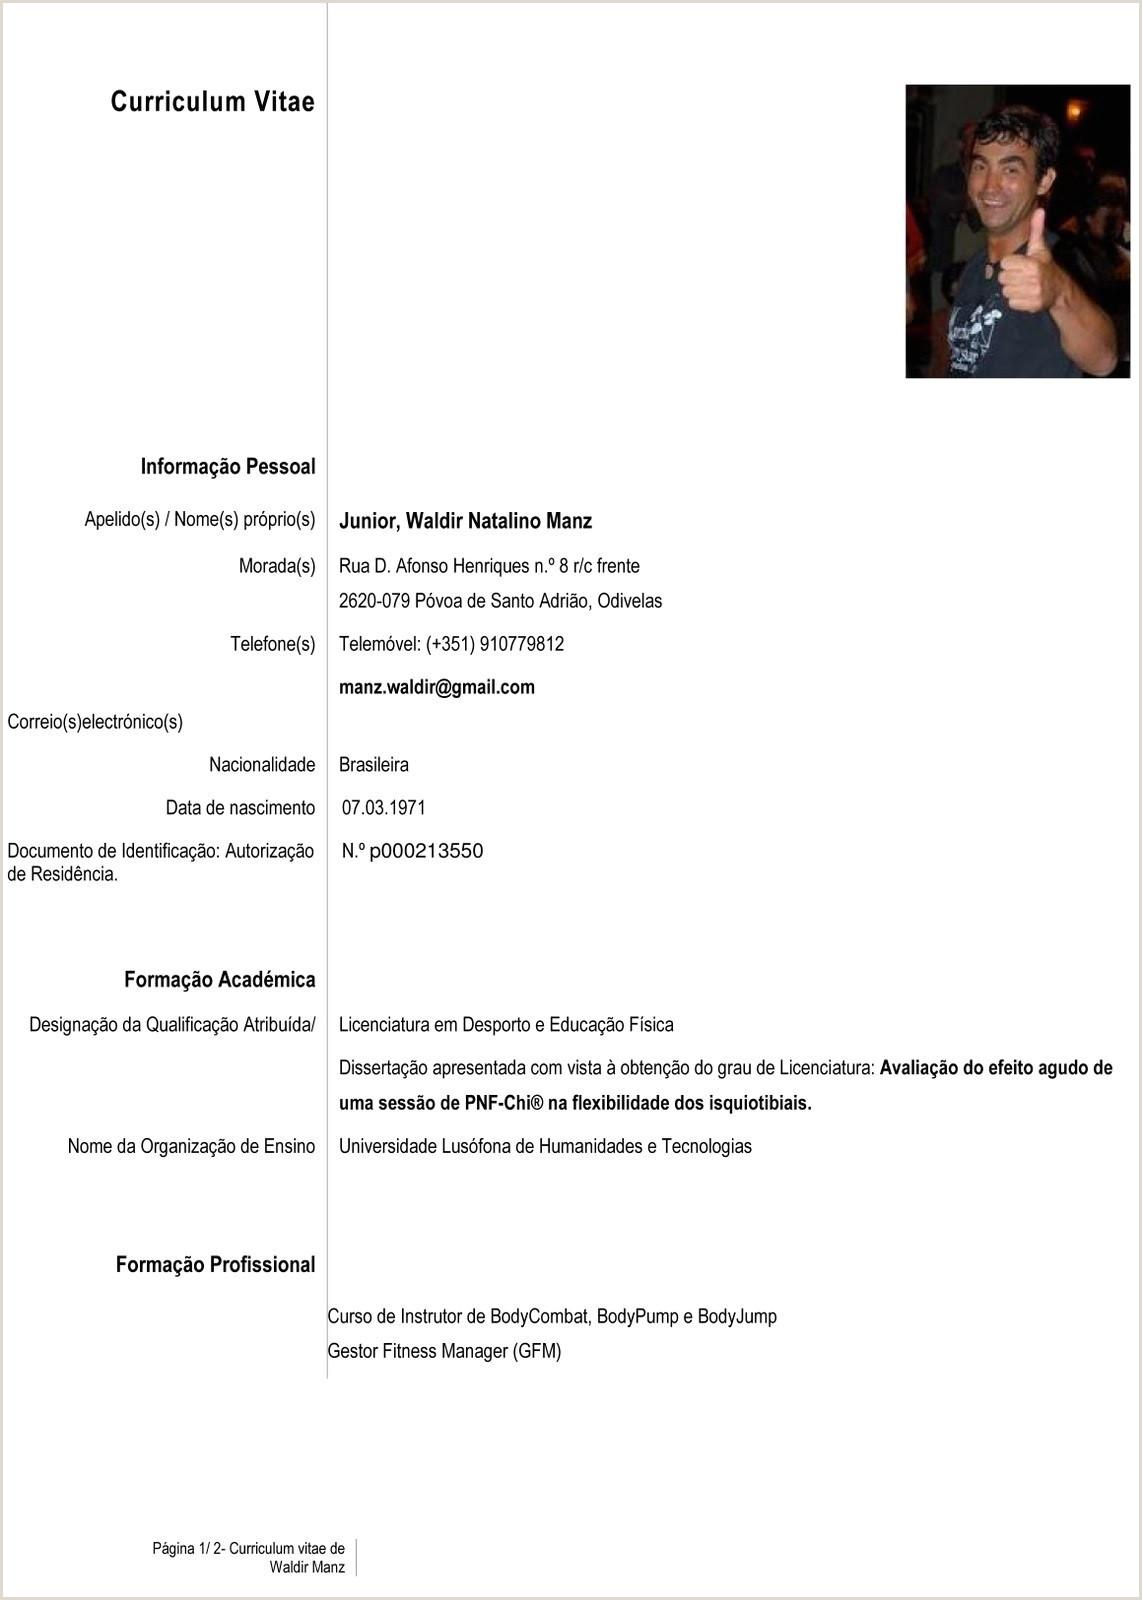 Curriculum Vitae Para Rellenar En Español 58 Modelo De Curriculum Vitae Espa±ol Para Rellenar